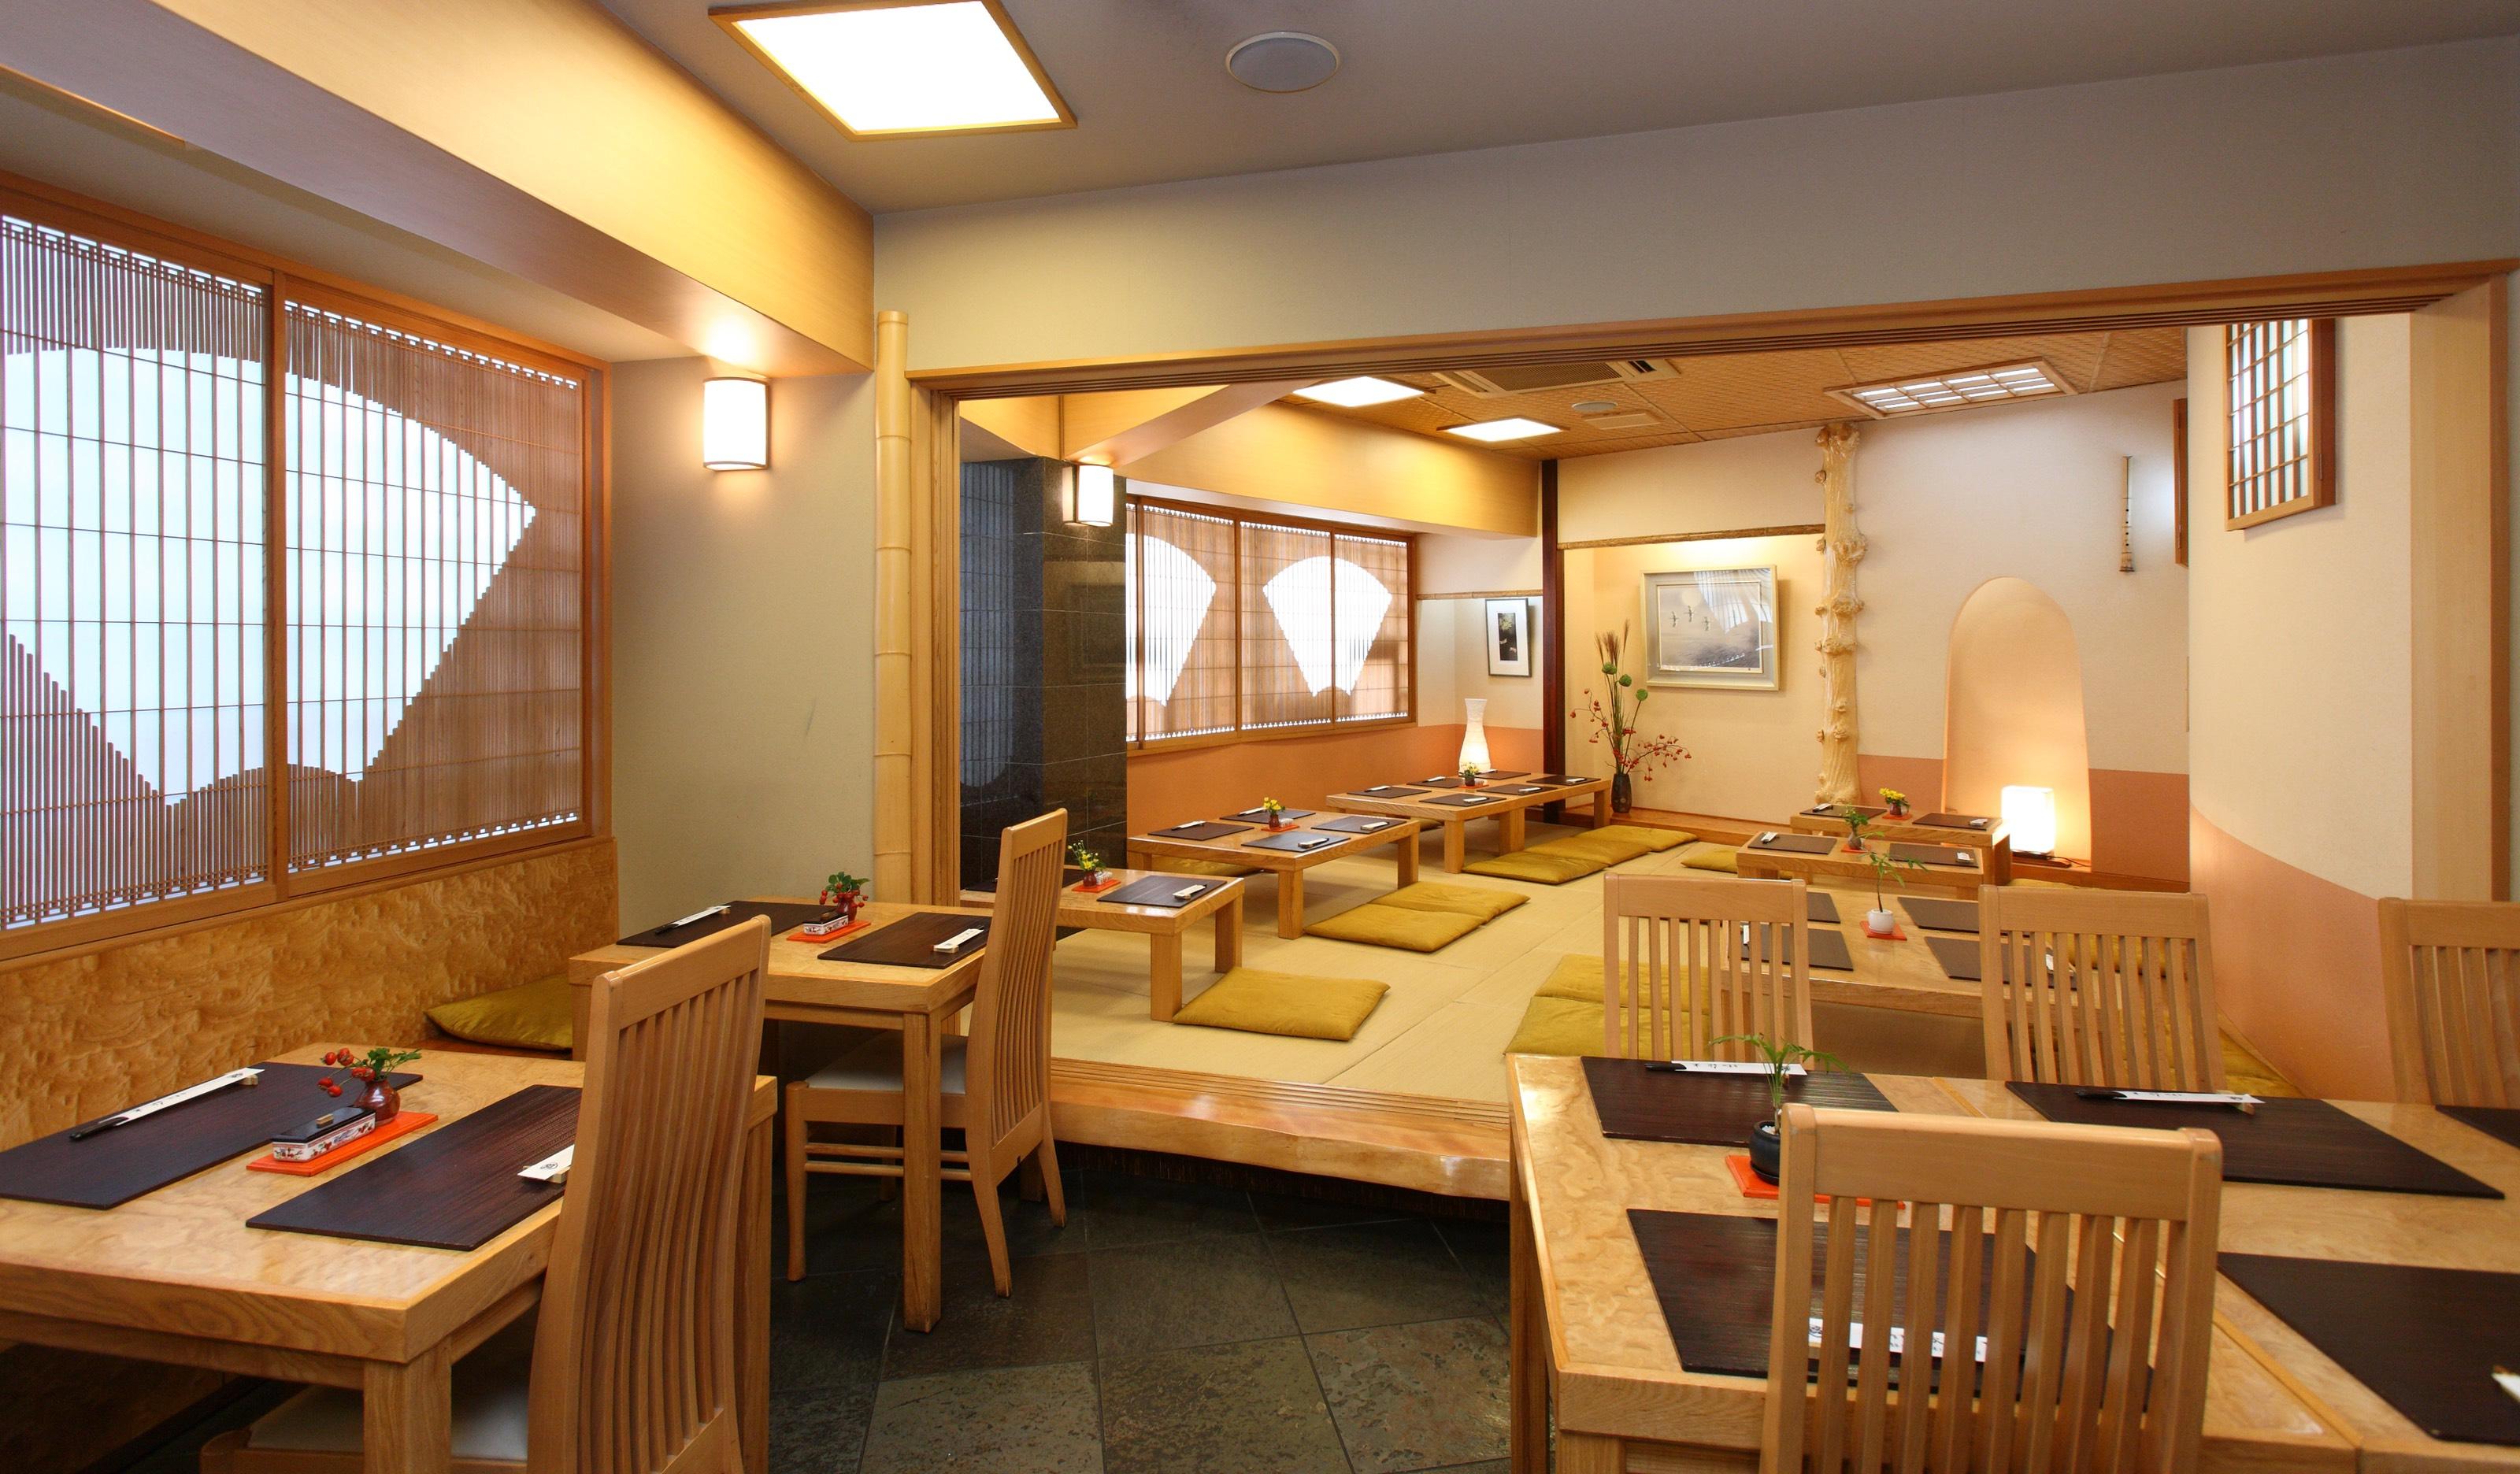 鎌倉秋本 Kamakura AKIMOTO